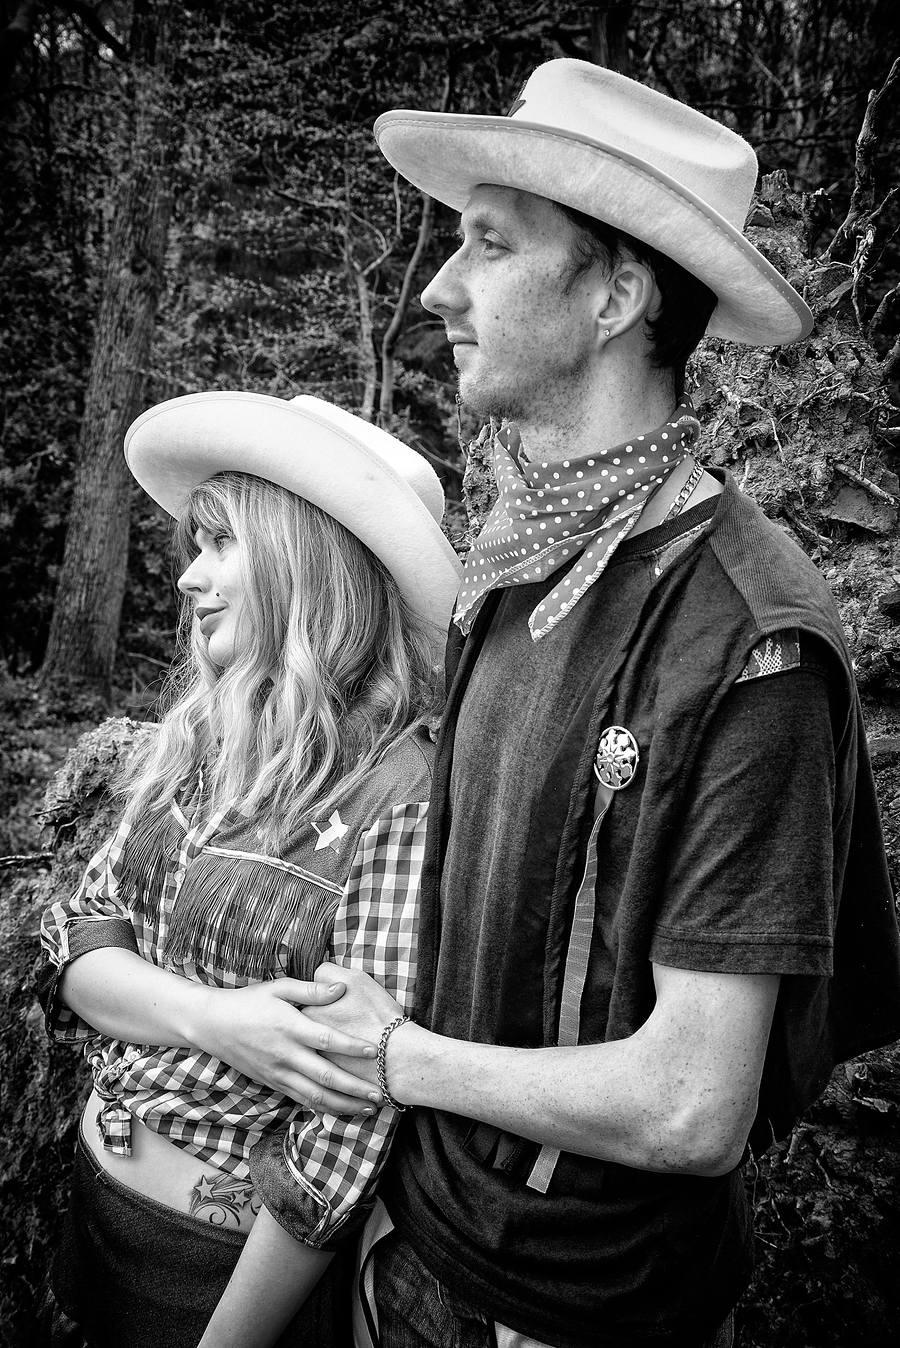 Country shoot / Model Jade3, Taken at Far Forest Studio / Uploaded 22nd April 2018 @ 07:55 PM